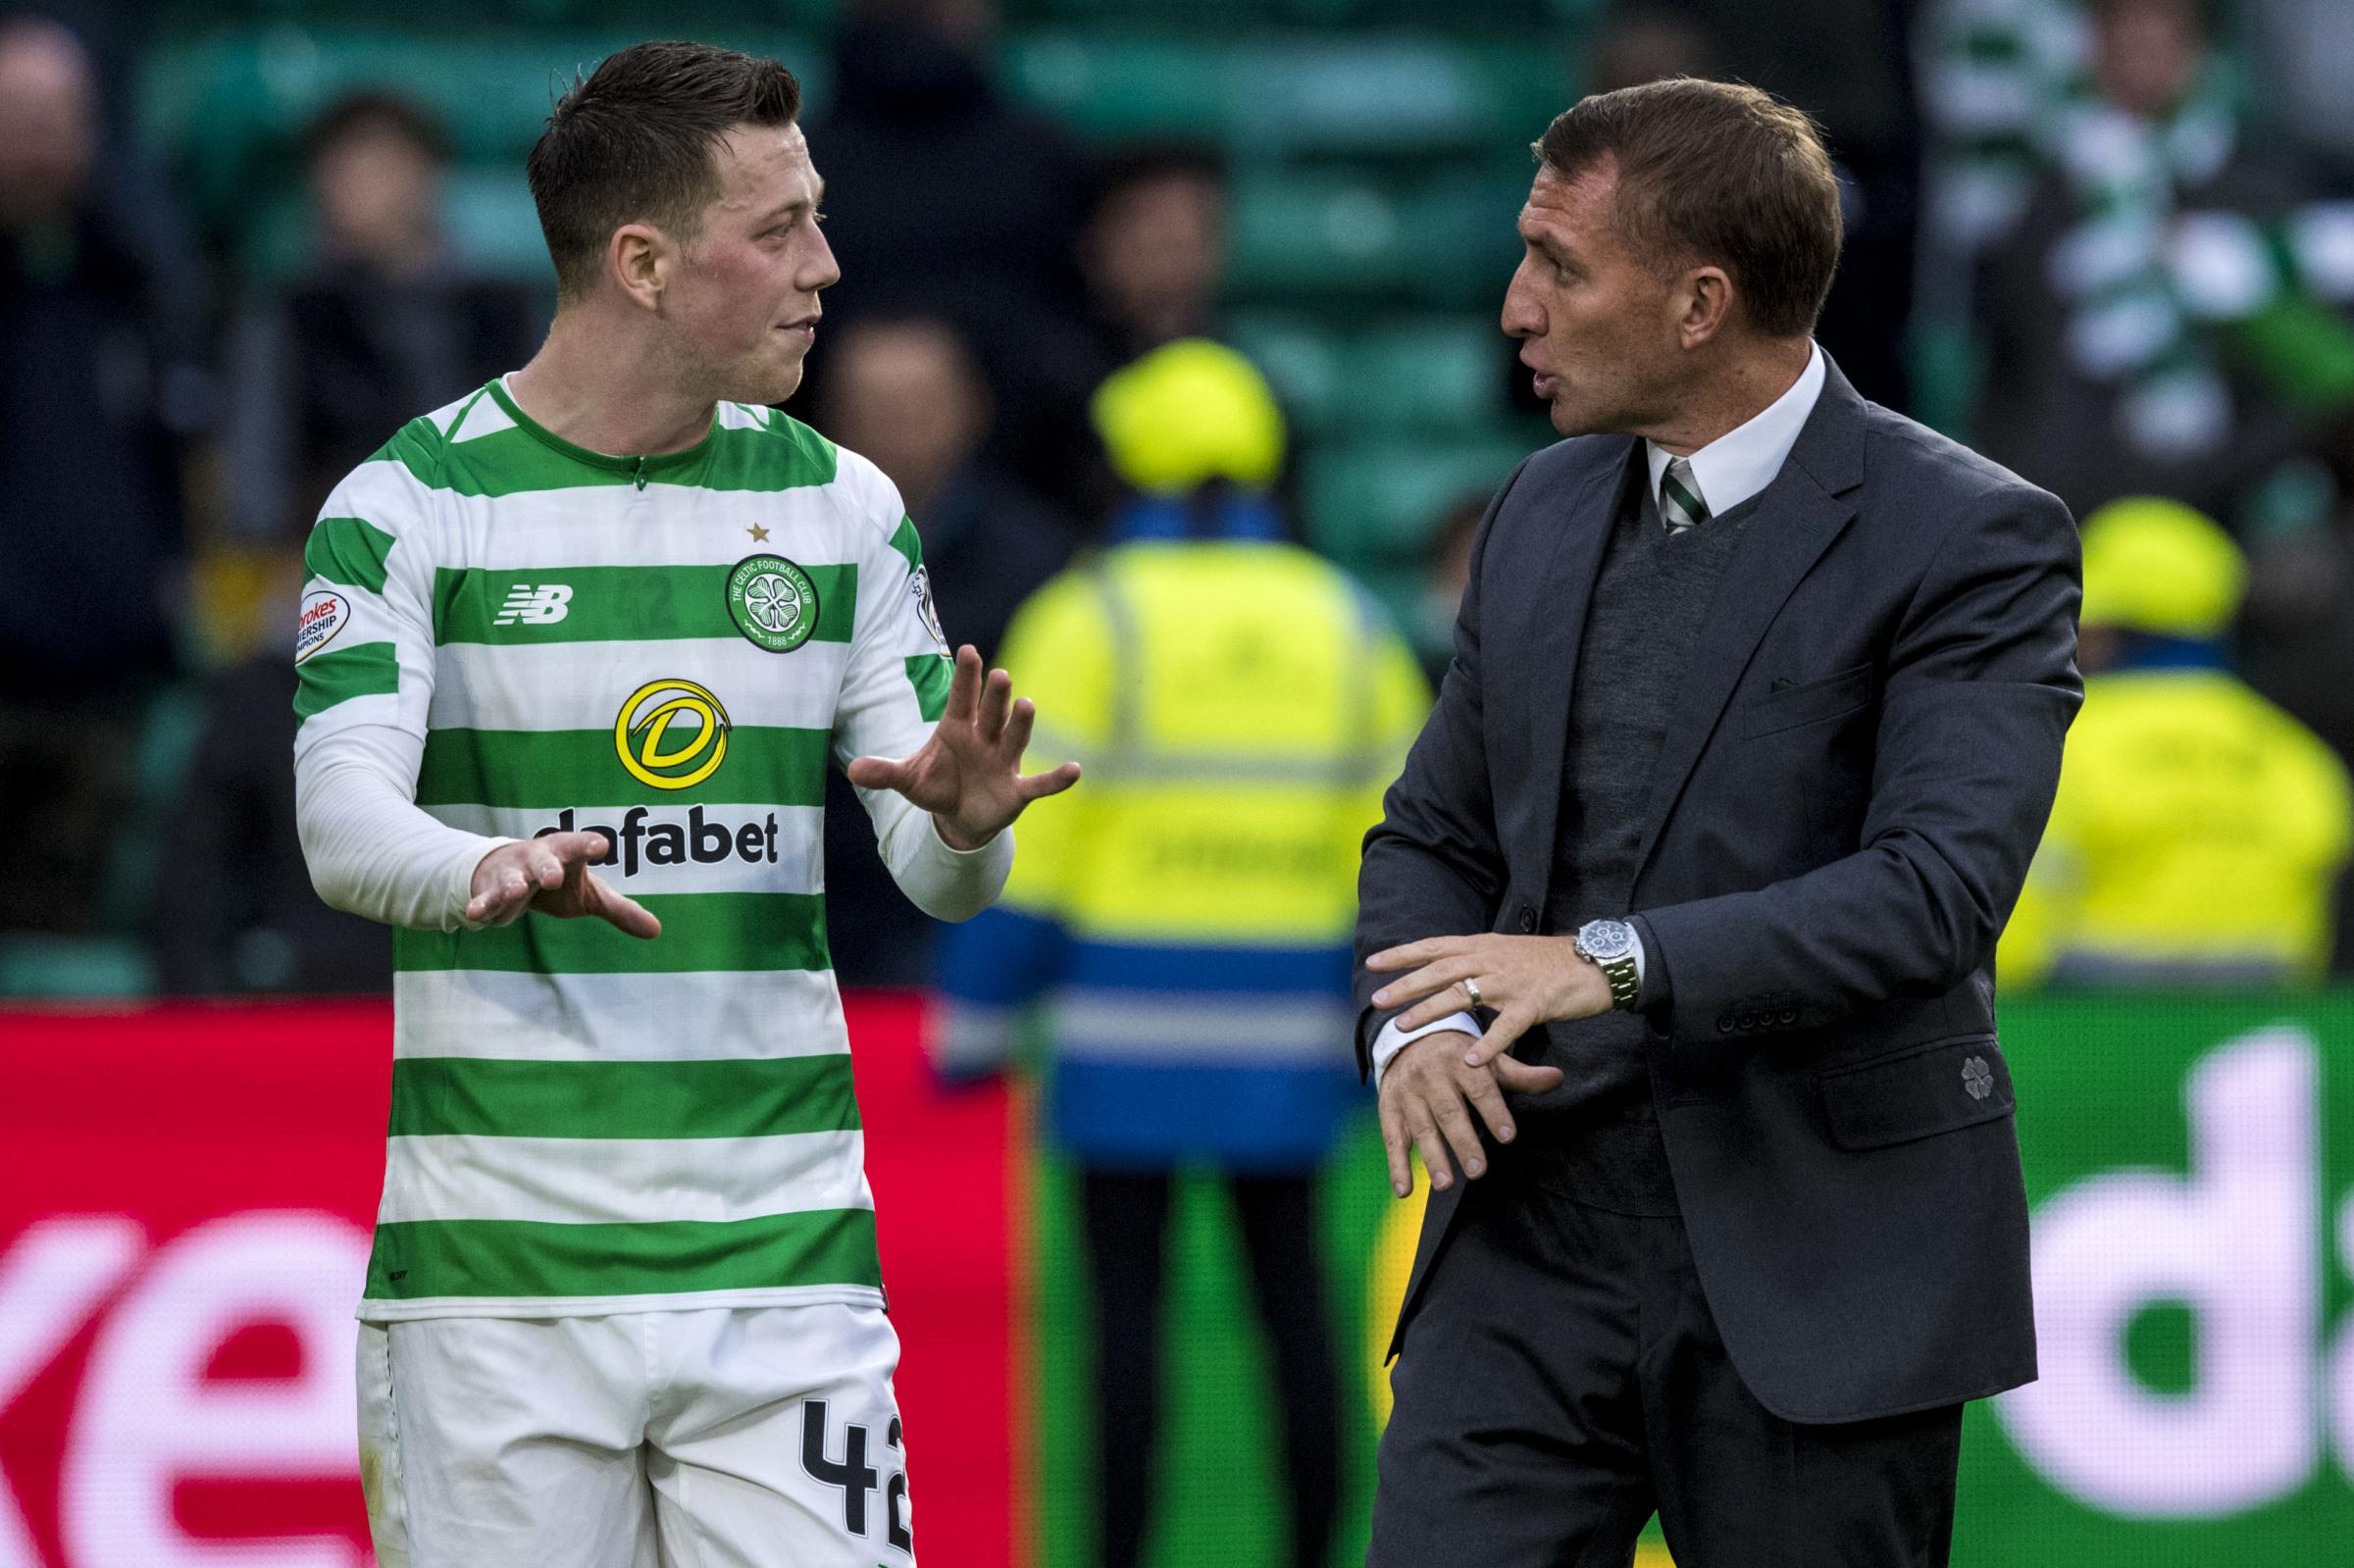 Callum McGregor believes VAR won't eliminate controversial decisions from game